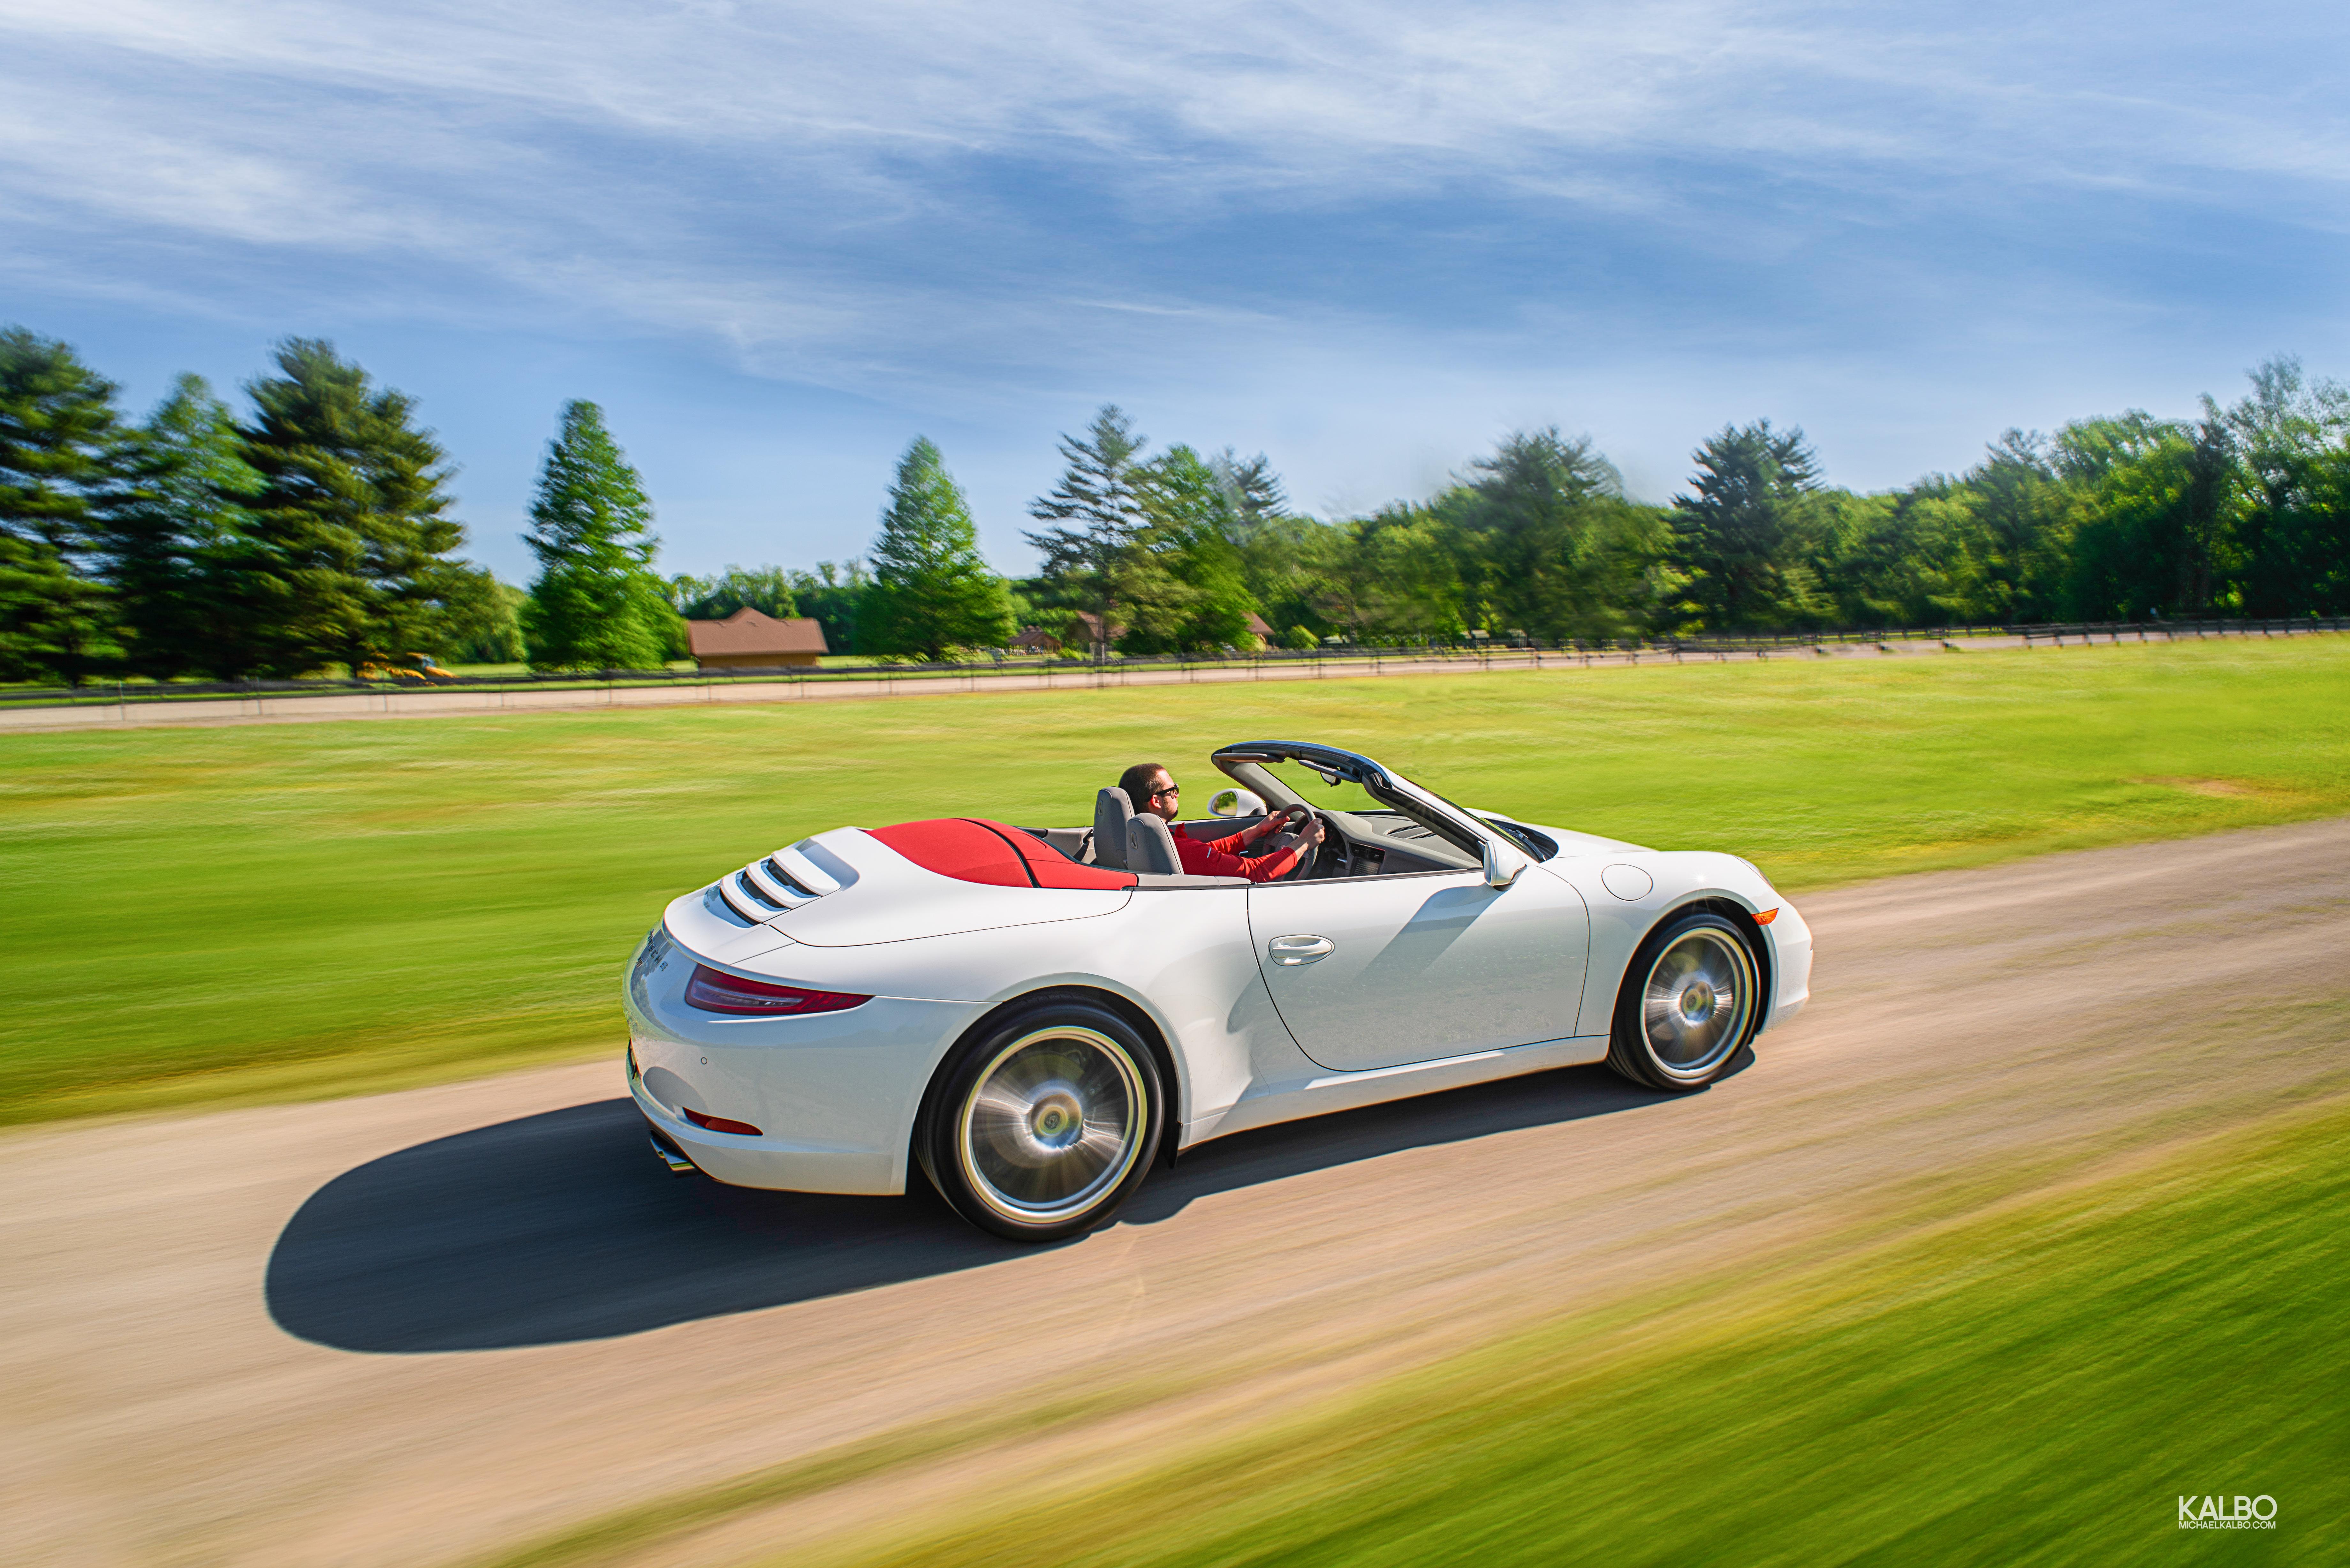 Michael-KALBO-x-Porsche-North-Olmsted-0553